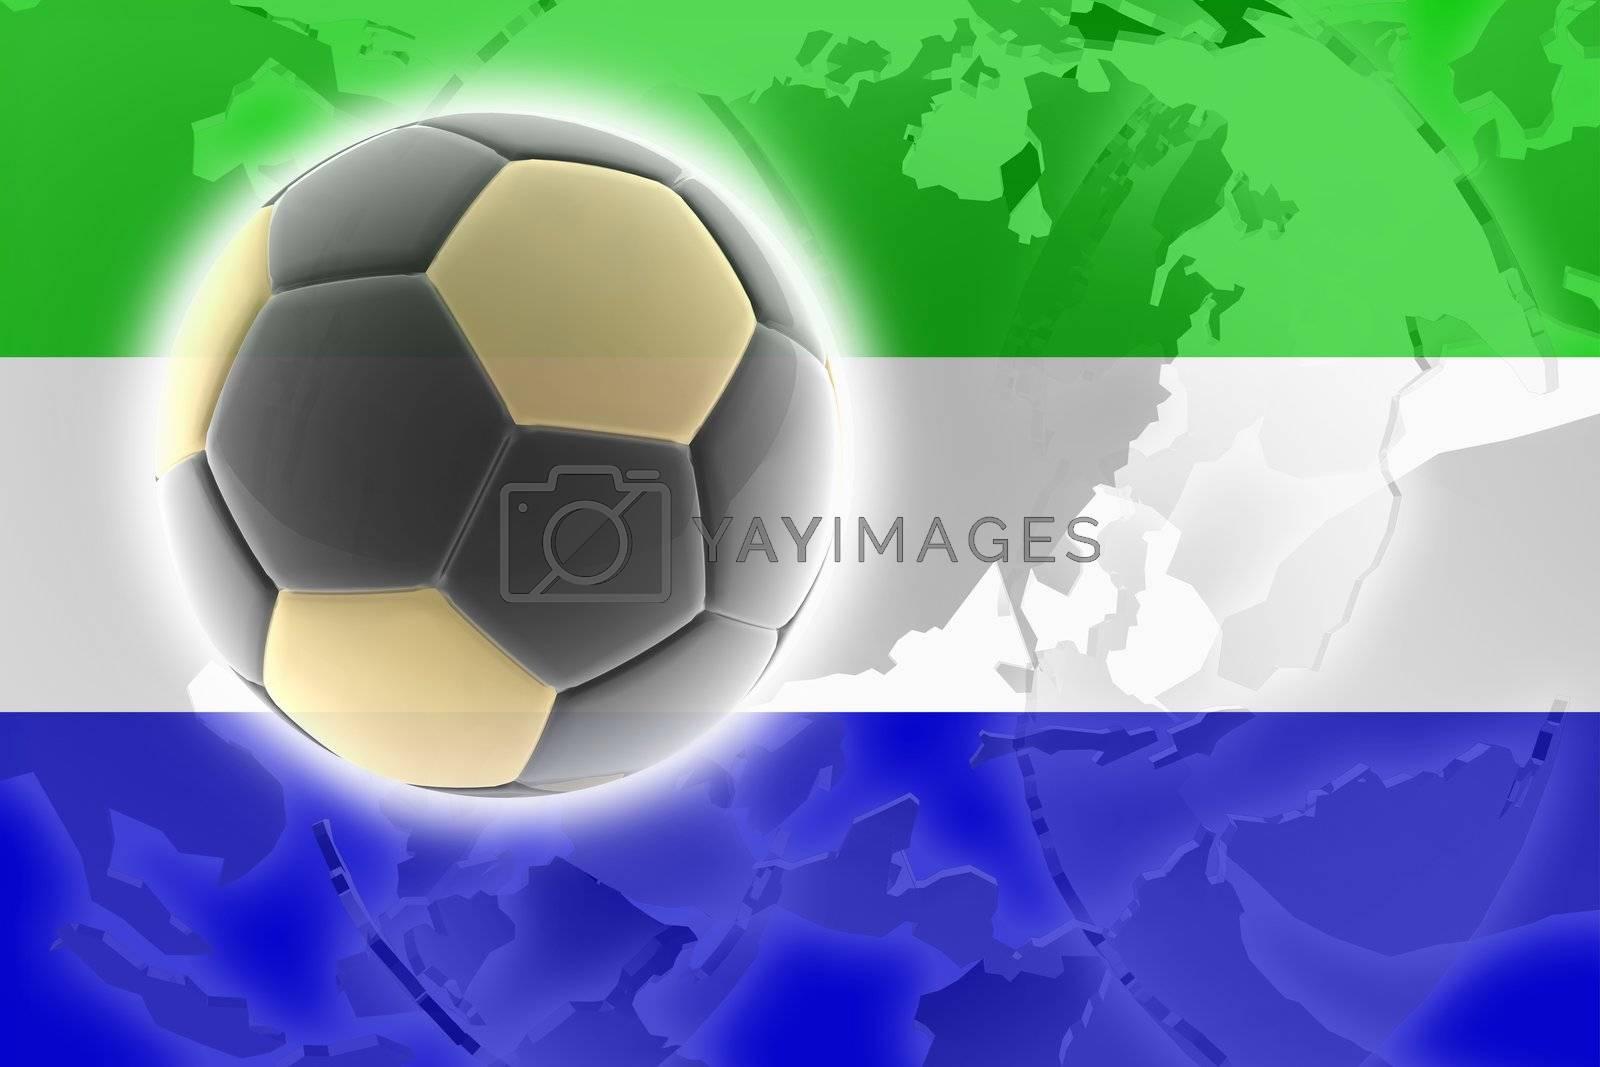 Flag of Sierra Leone, national country symbol illustration sports soccer football